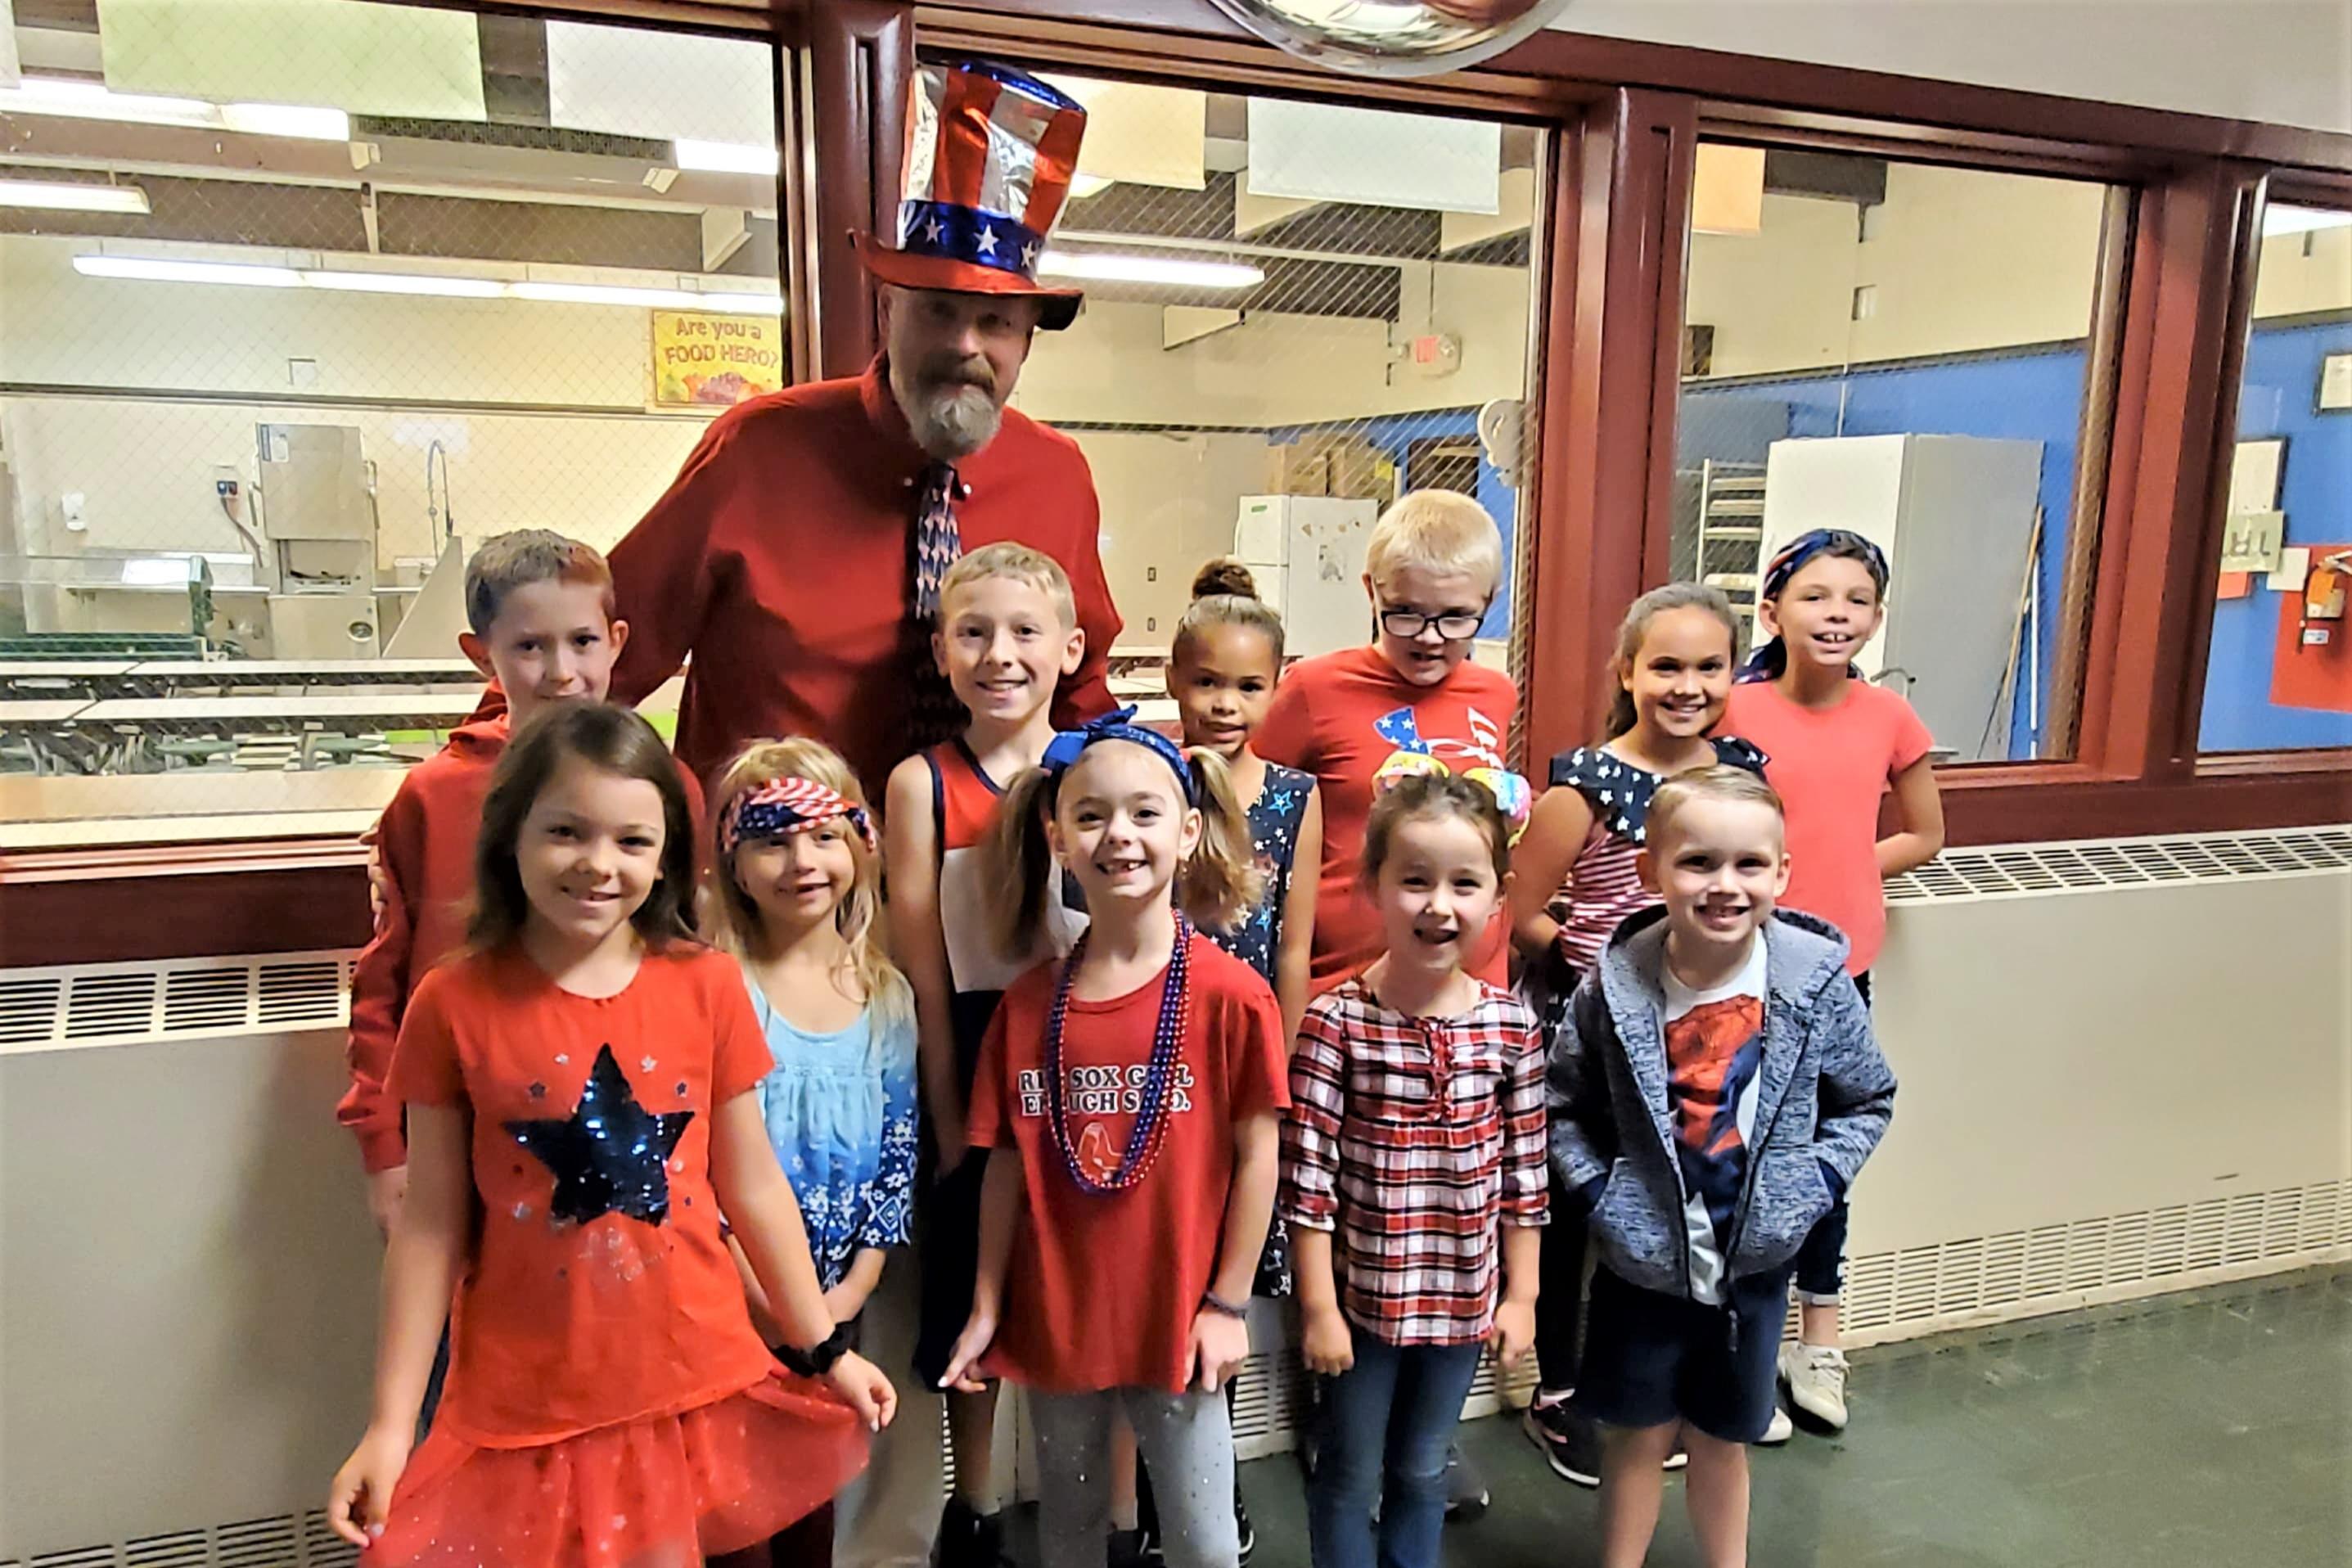 Mr. Gianotti with students celebrating patriotism.